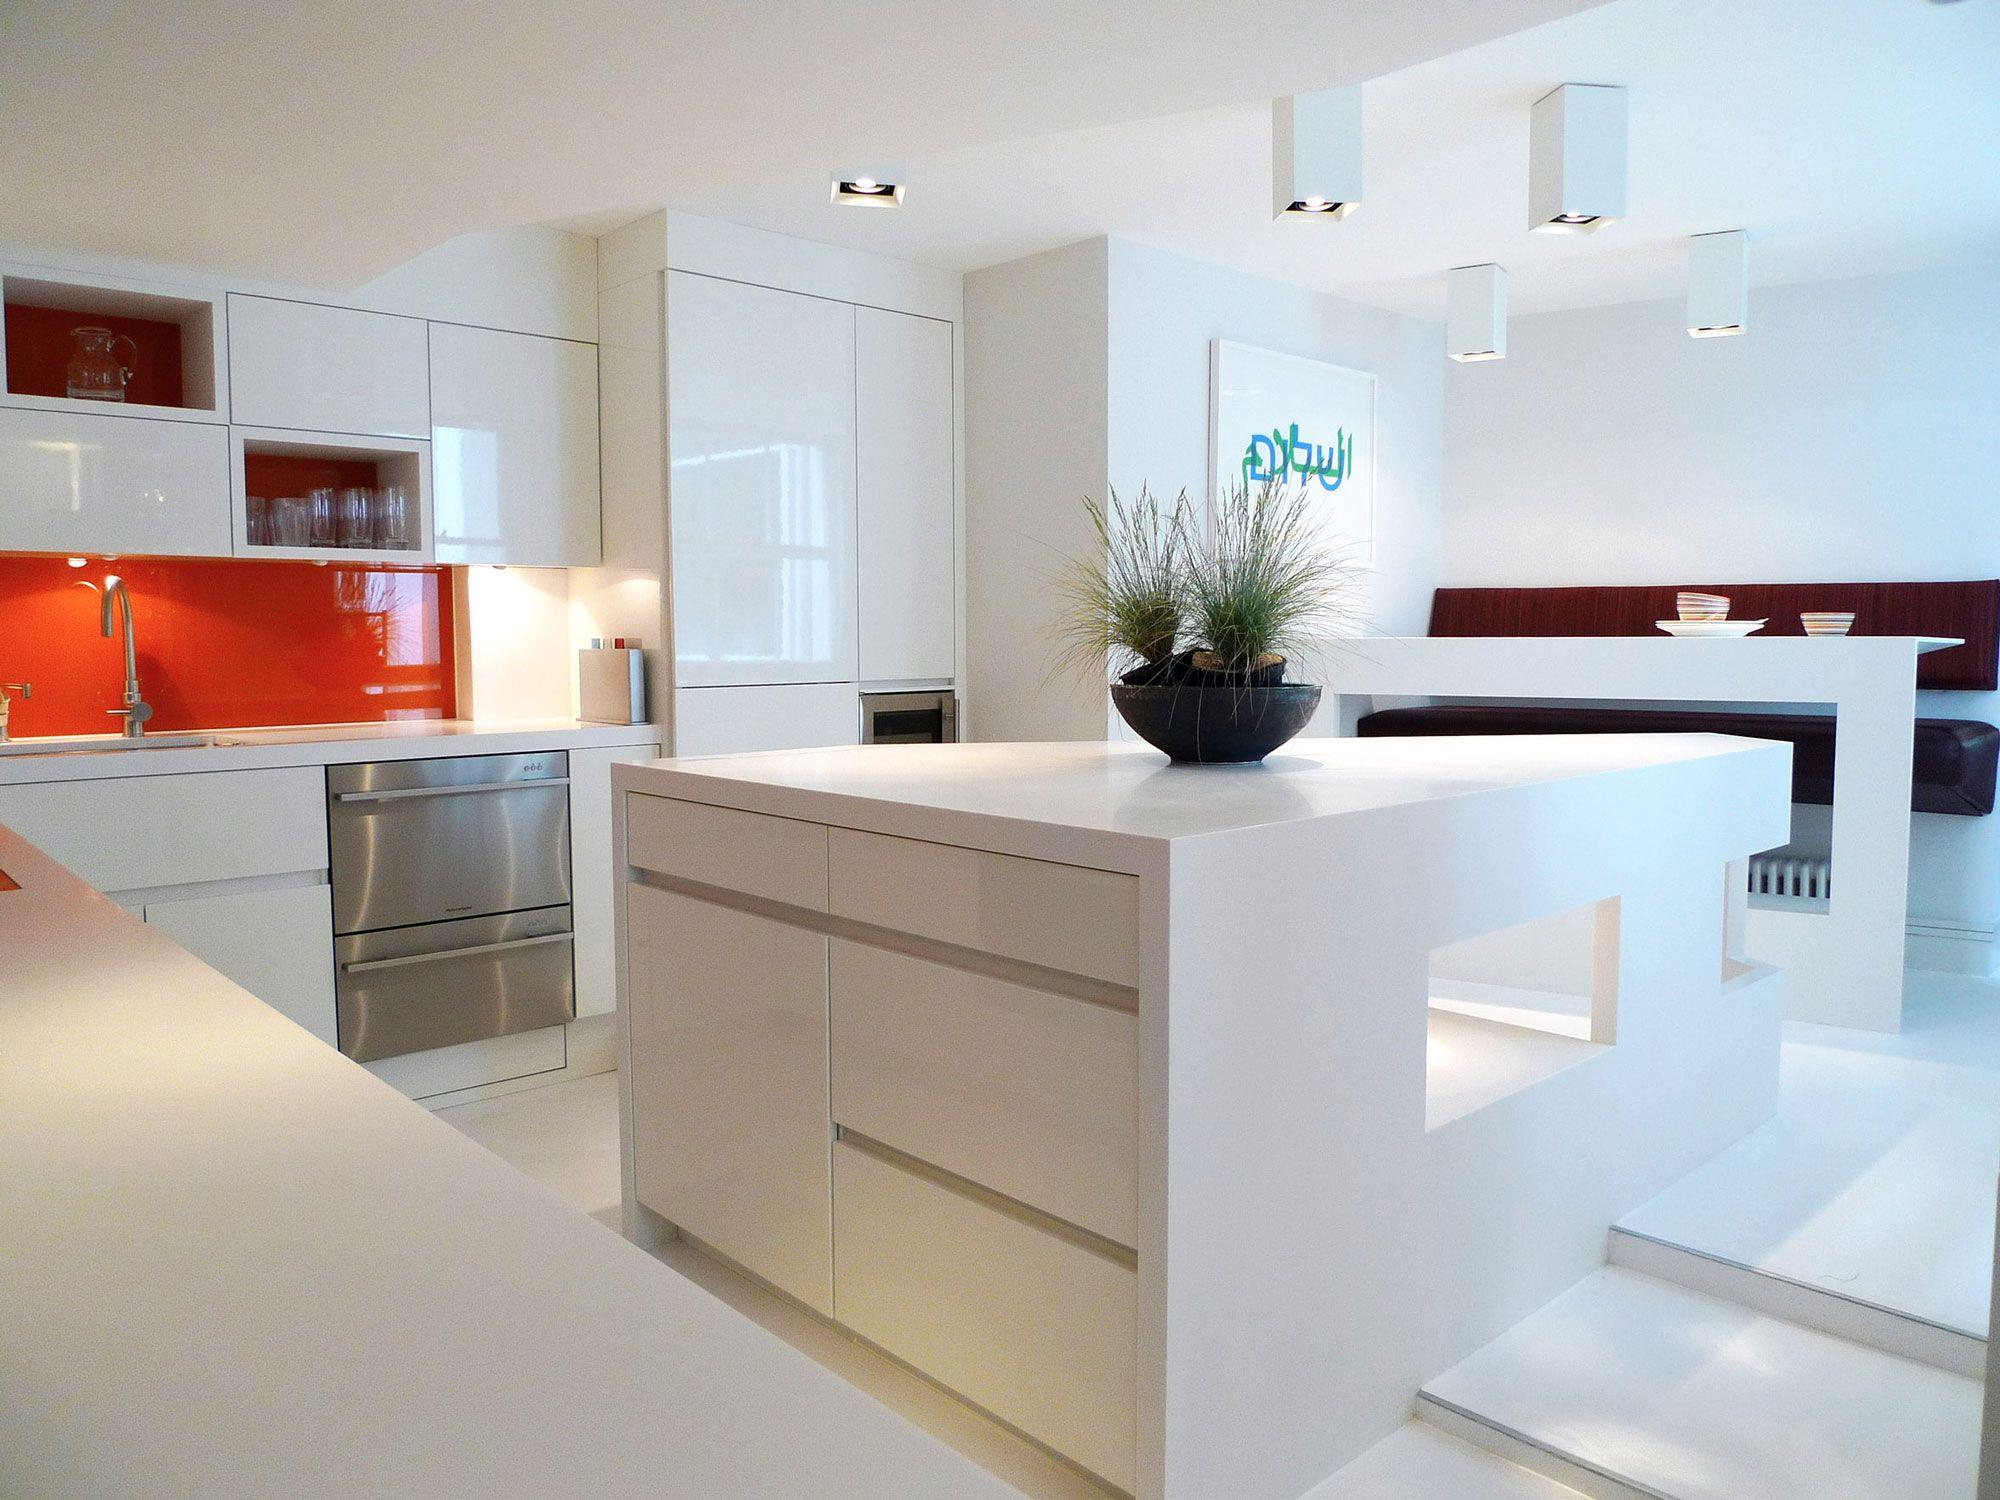 robinson van noort - contemporary residential design, london